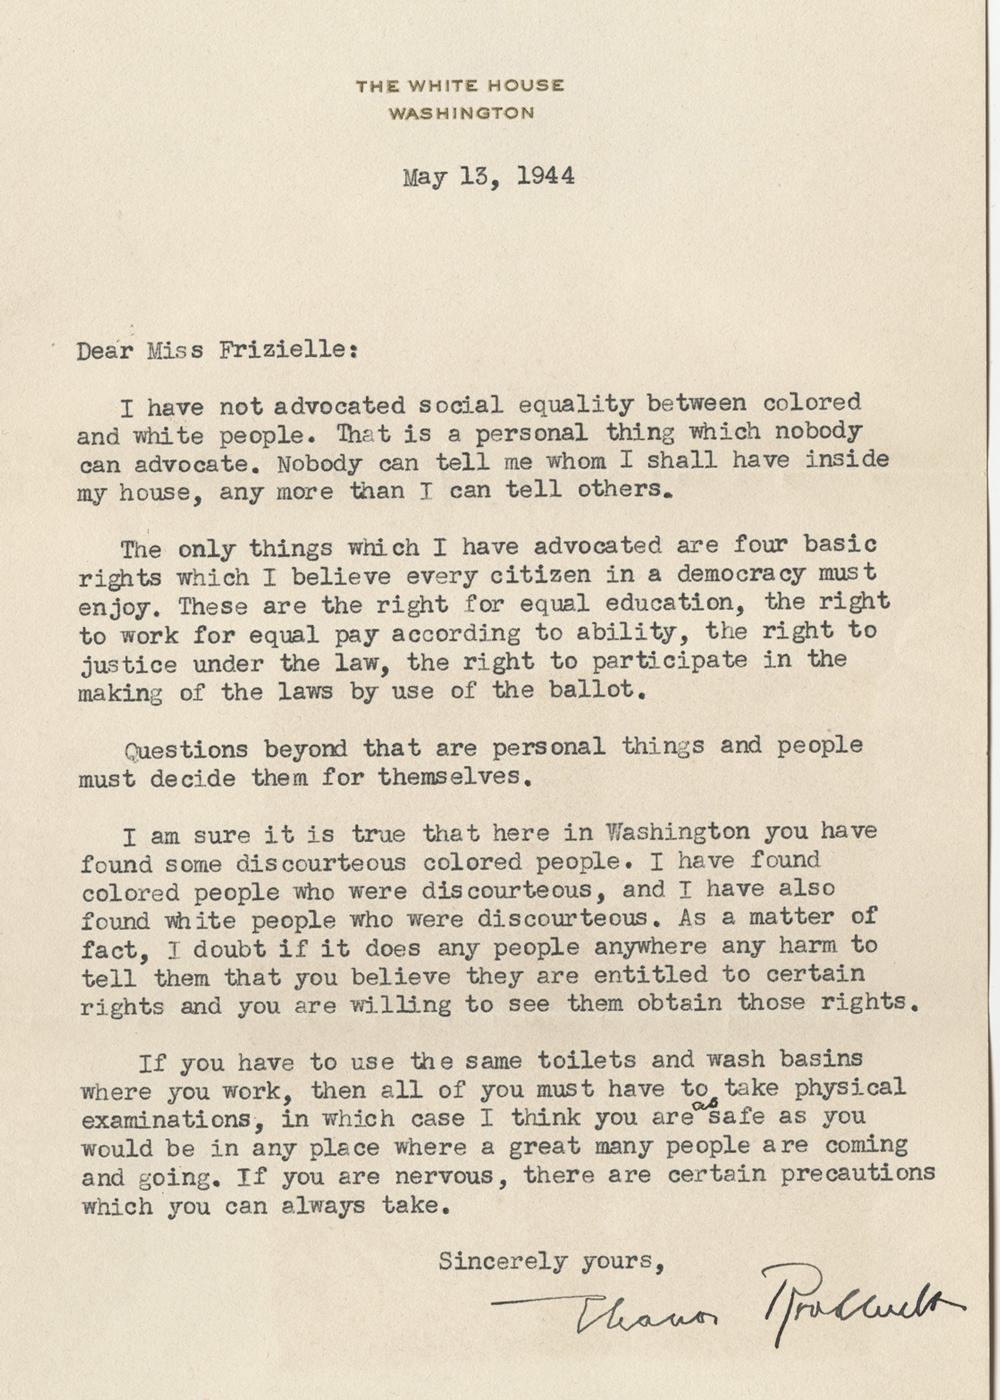 Eleanor Roosevelt to Addie Frizielle, May 13, 1944 (GLC09544)